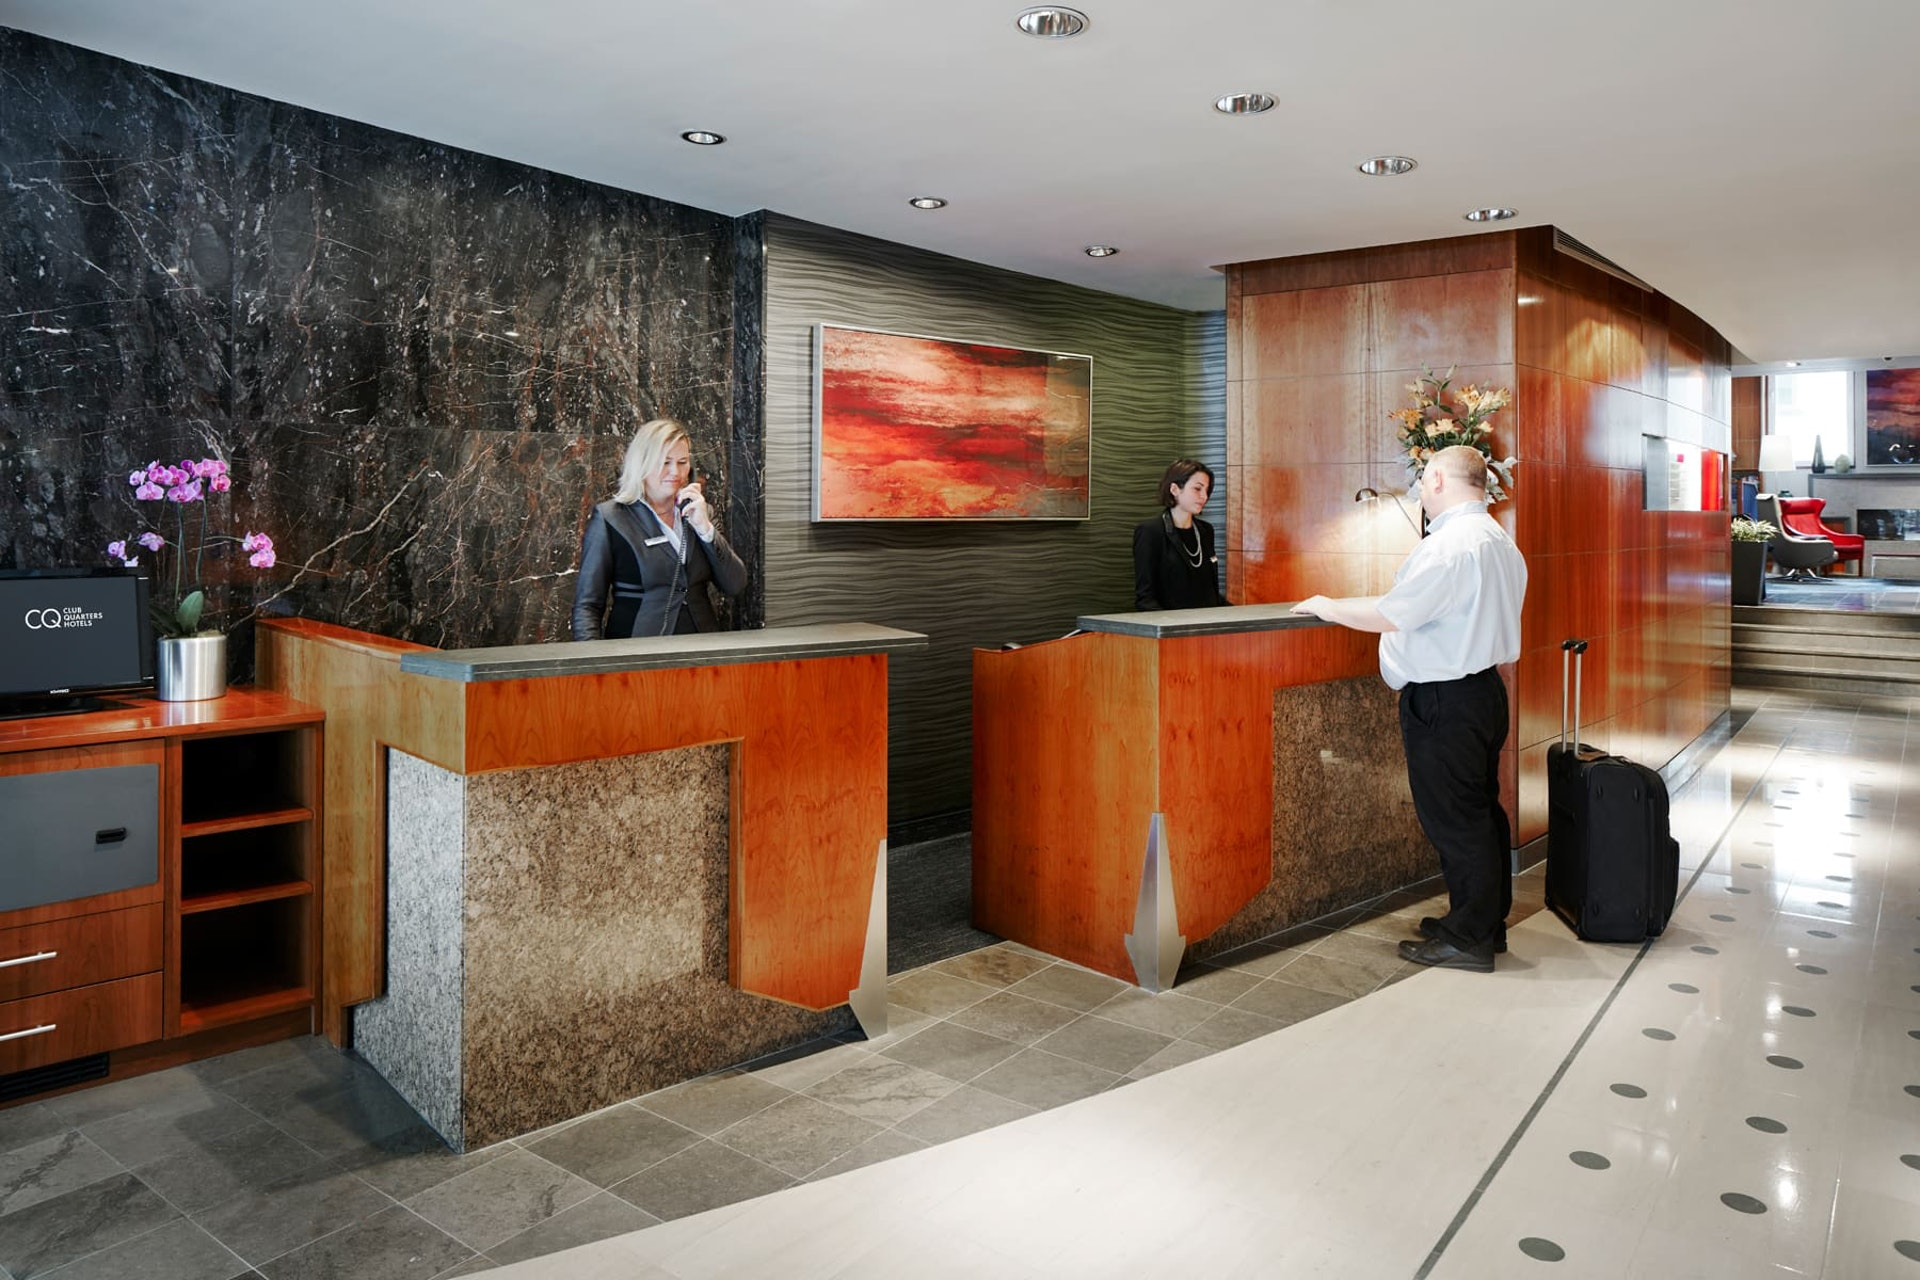 Lobby of CQ Hotel, St Paul's London